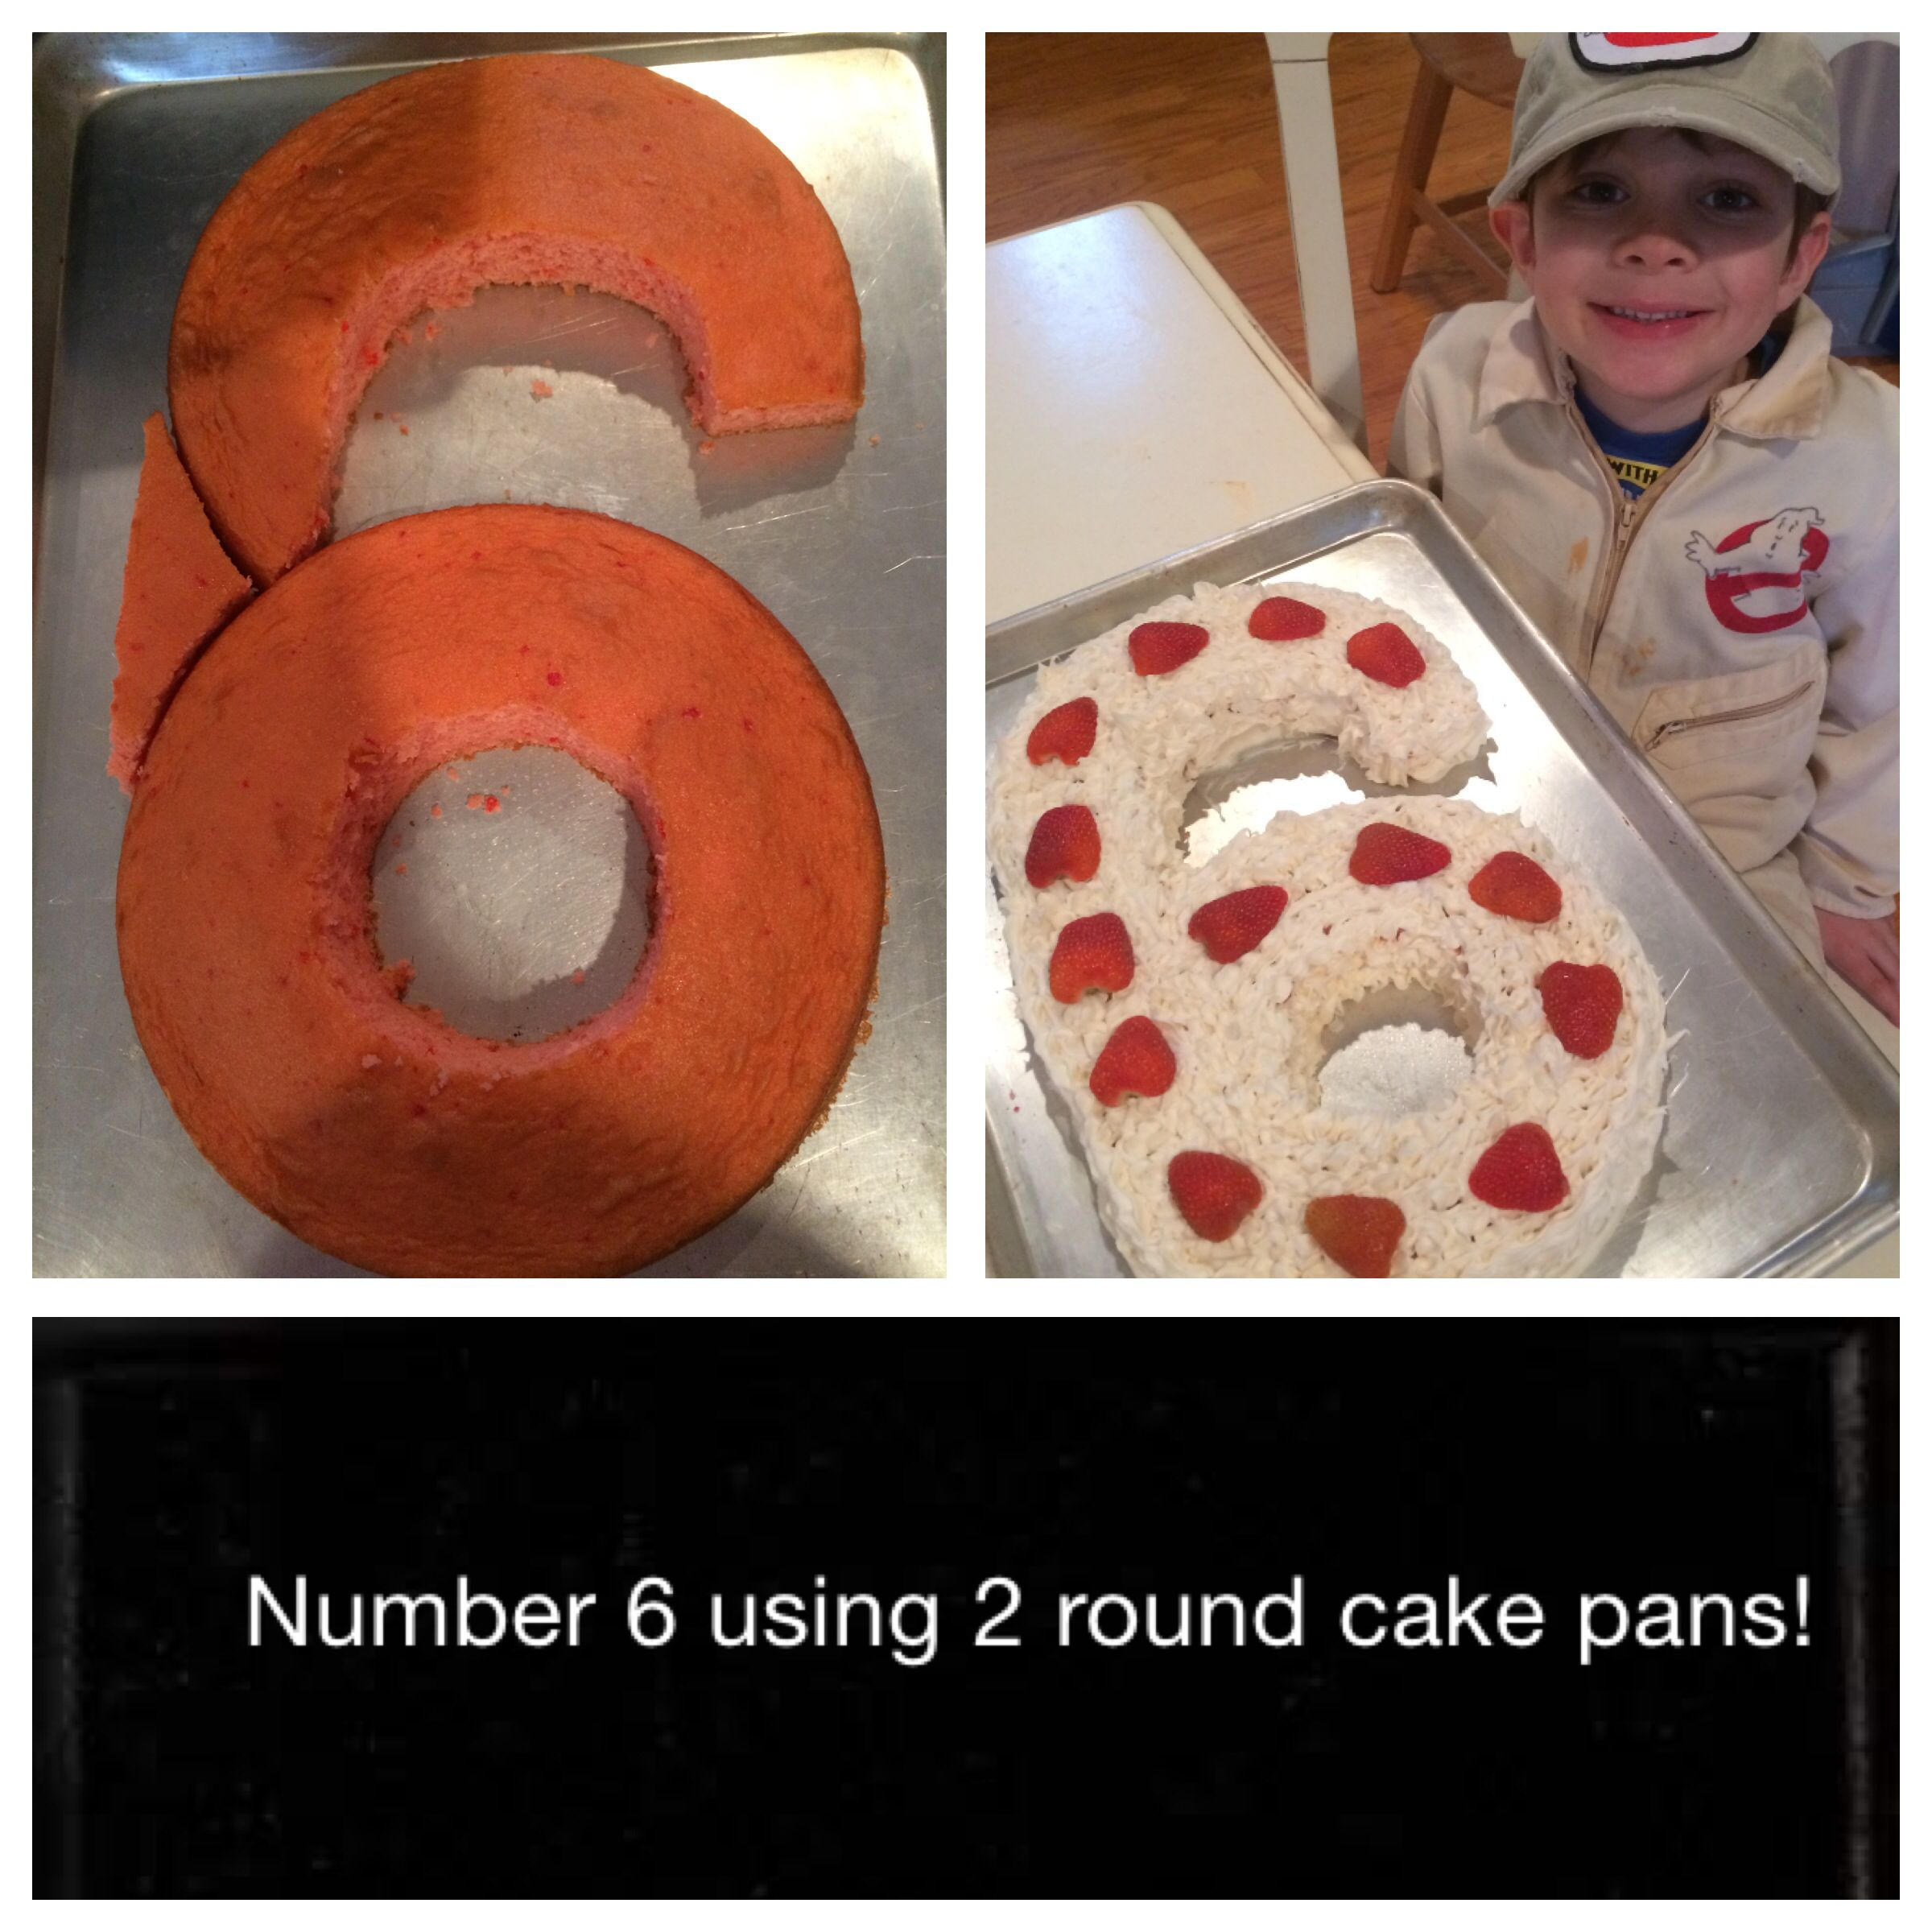 Number 6 Birthday Cake Using 2 Round Cake Pans